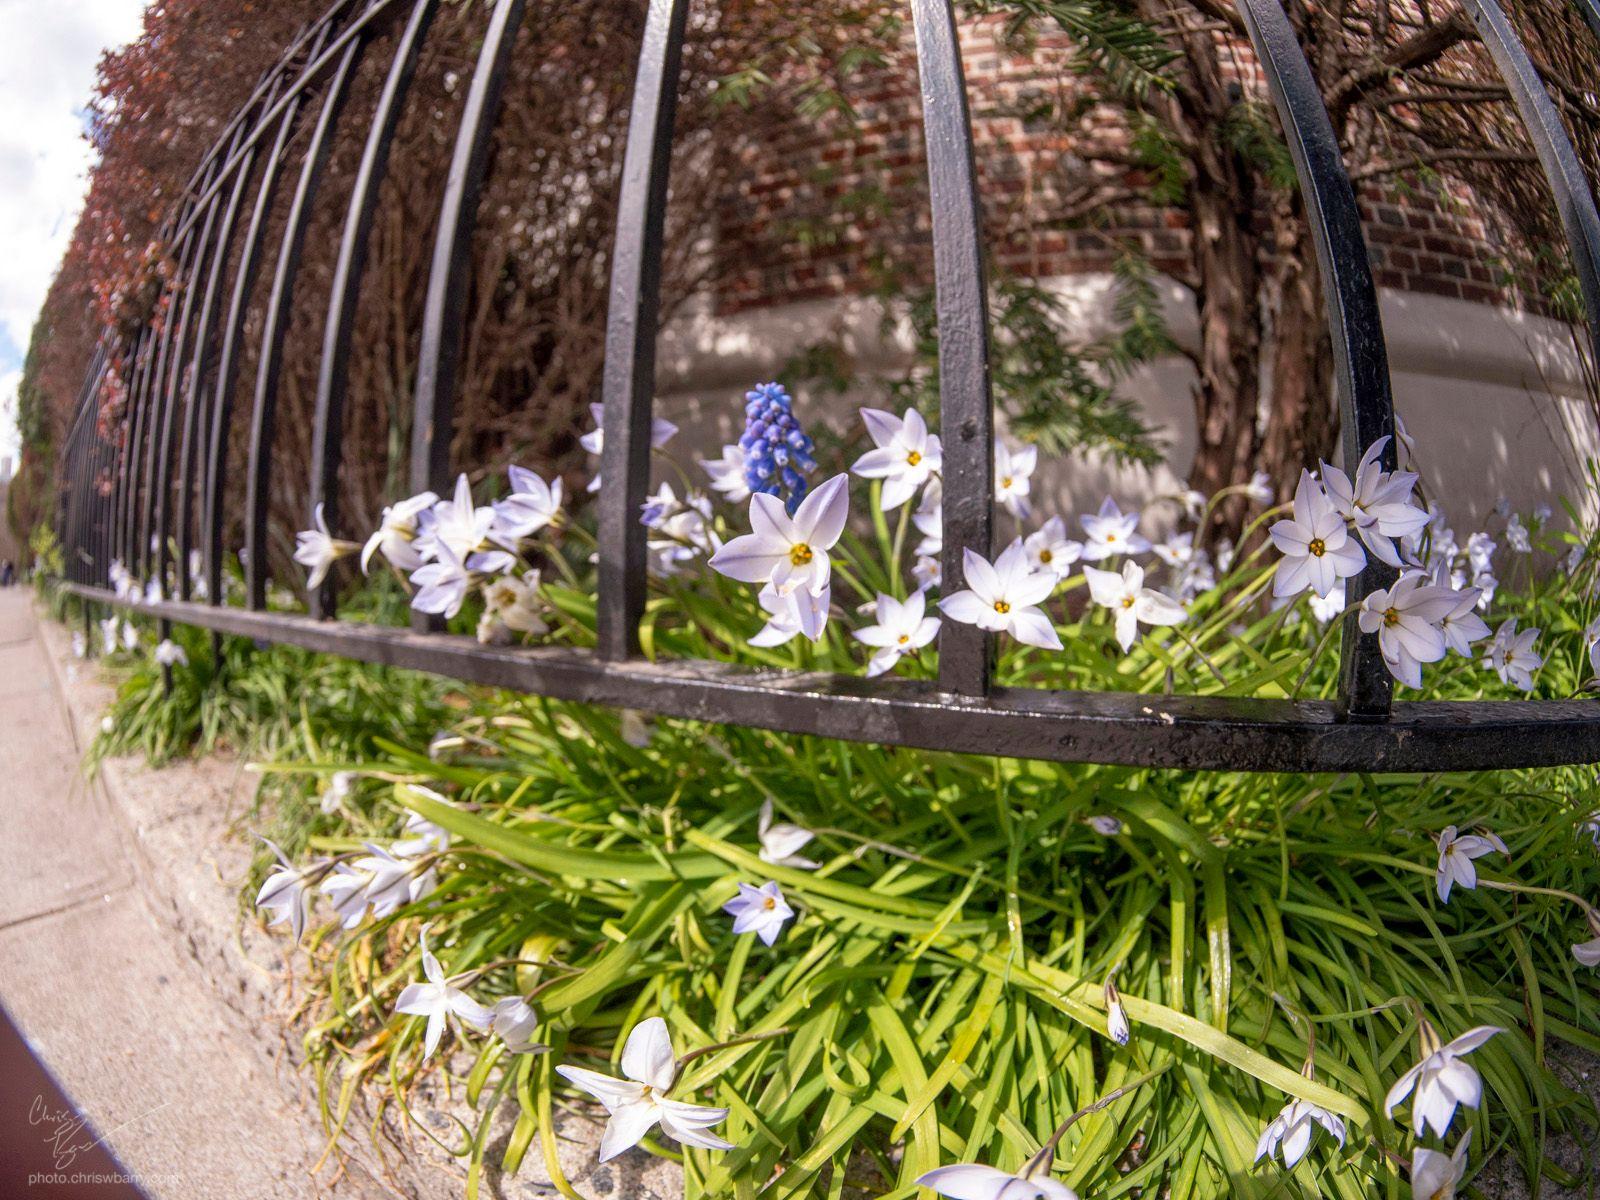 4-4-2020: Purple Flowers